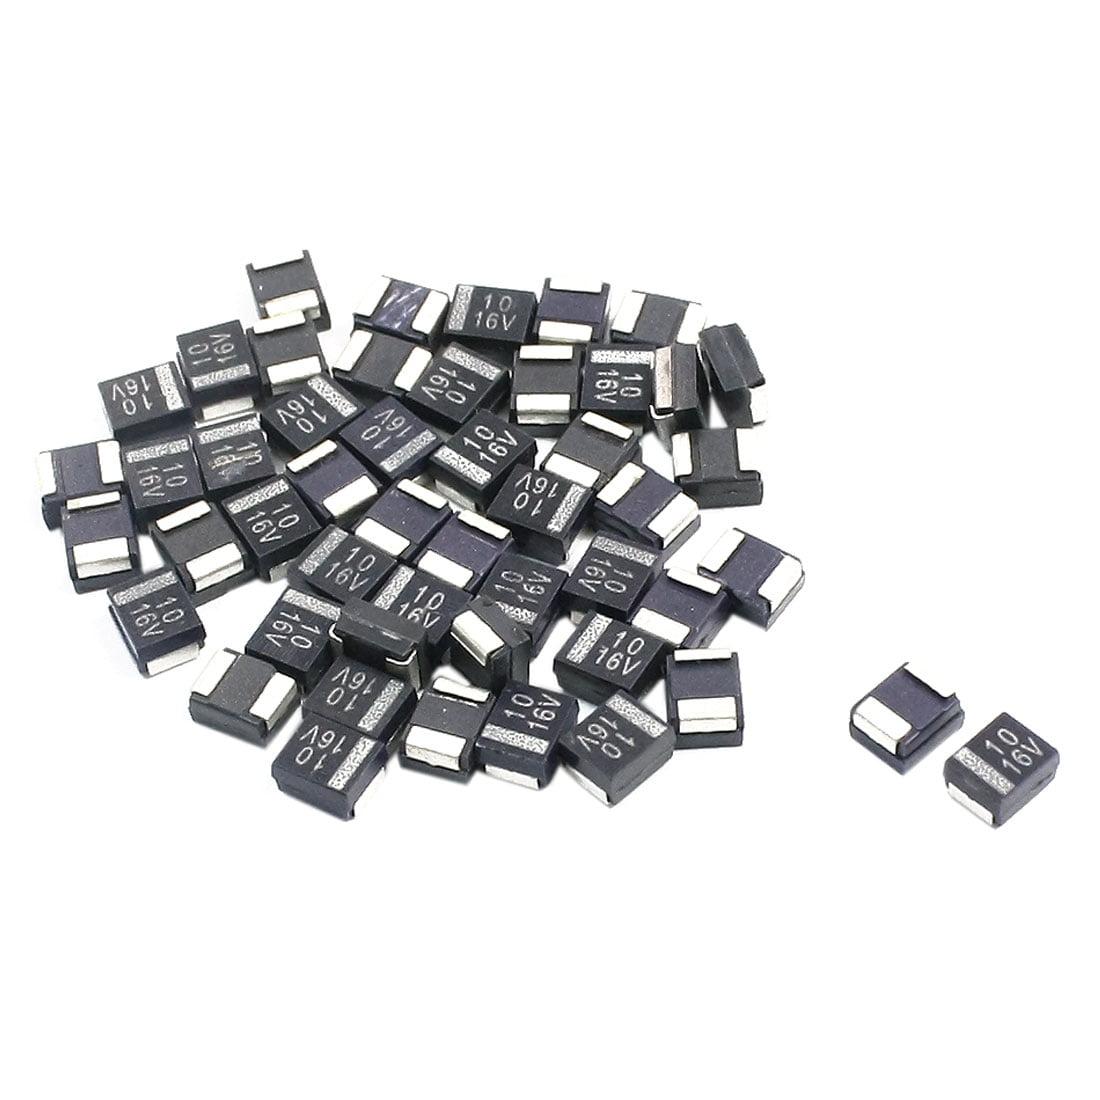 50PCS B Type 10uF 16V 4x3x2mm Black SMD SMT Tantalum Chip Capacitor - image 1 of 1